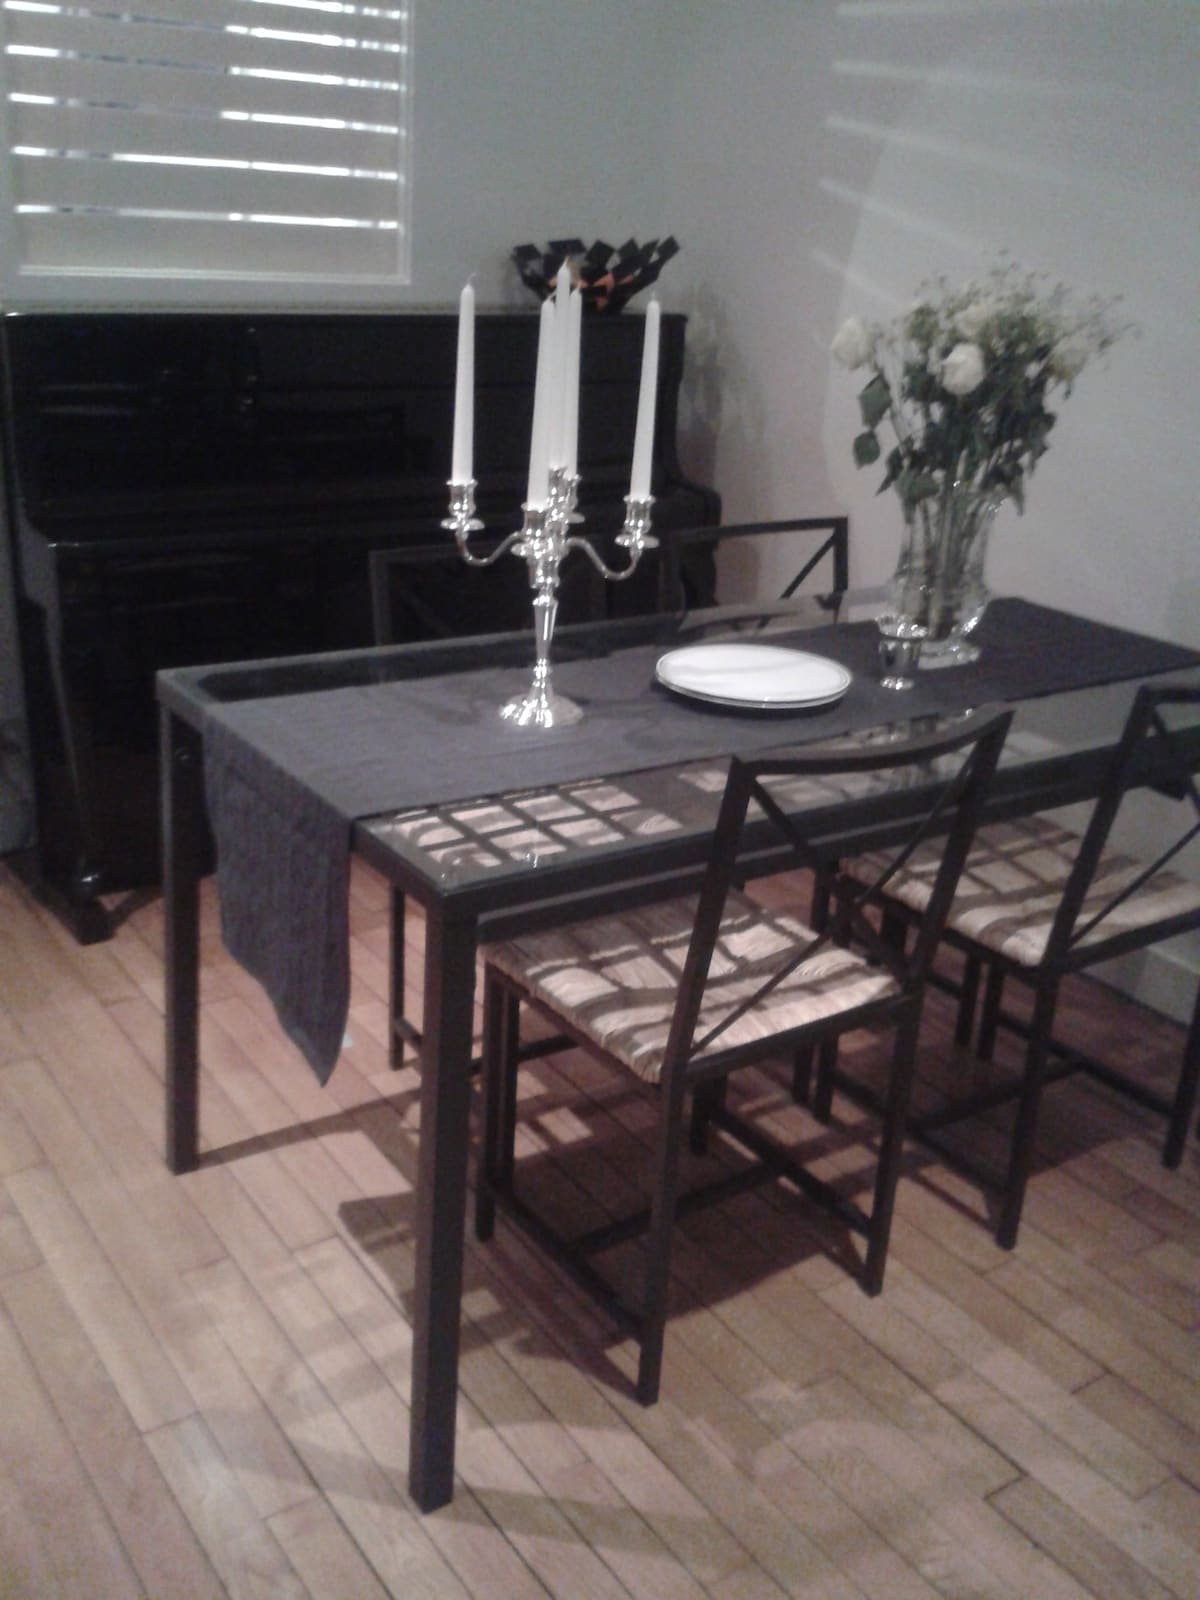 A nice dining room